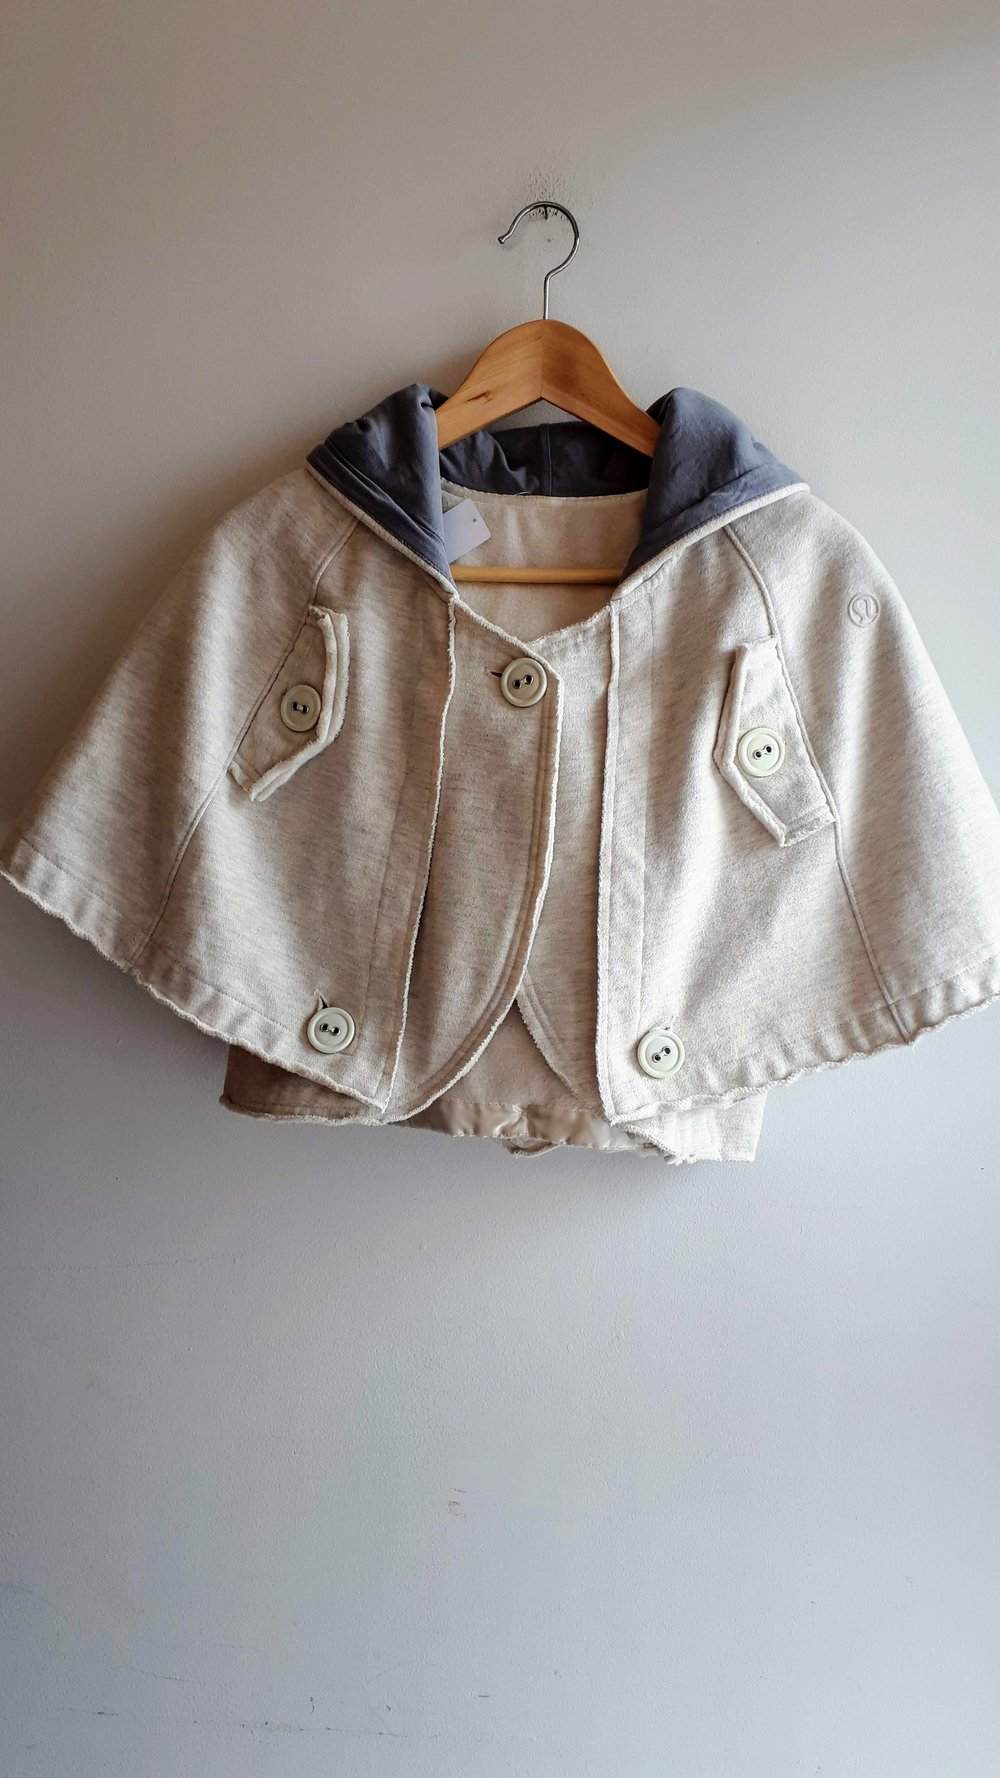 Lululemon cape; Size S, $48